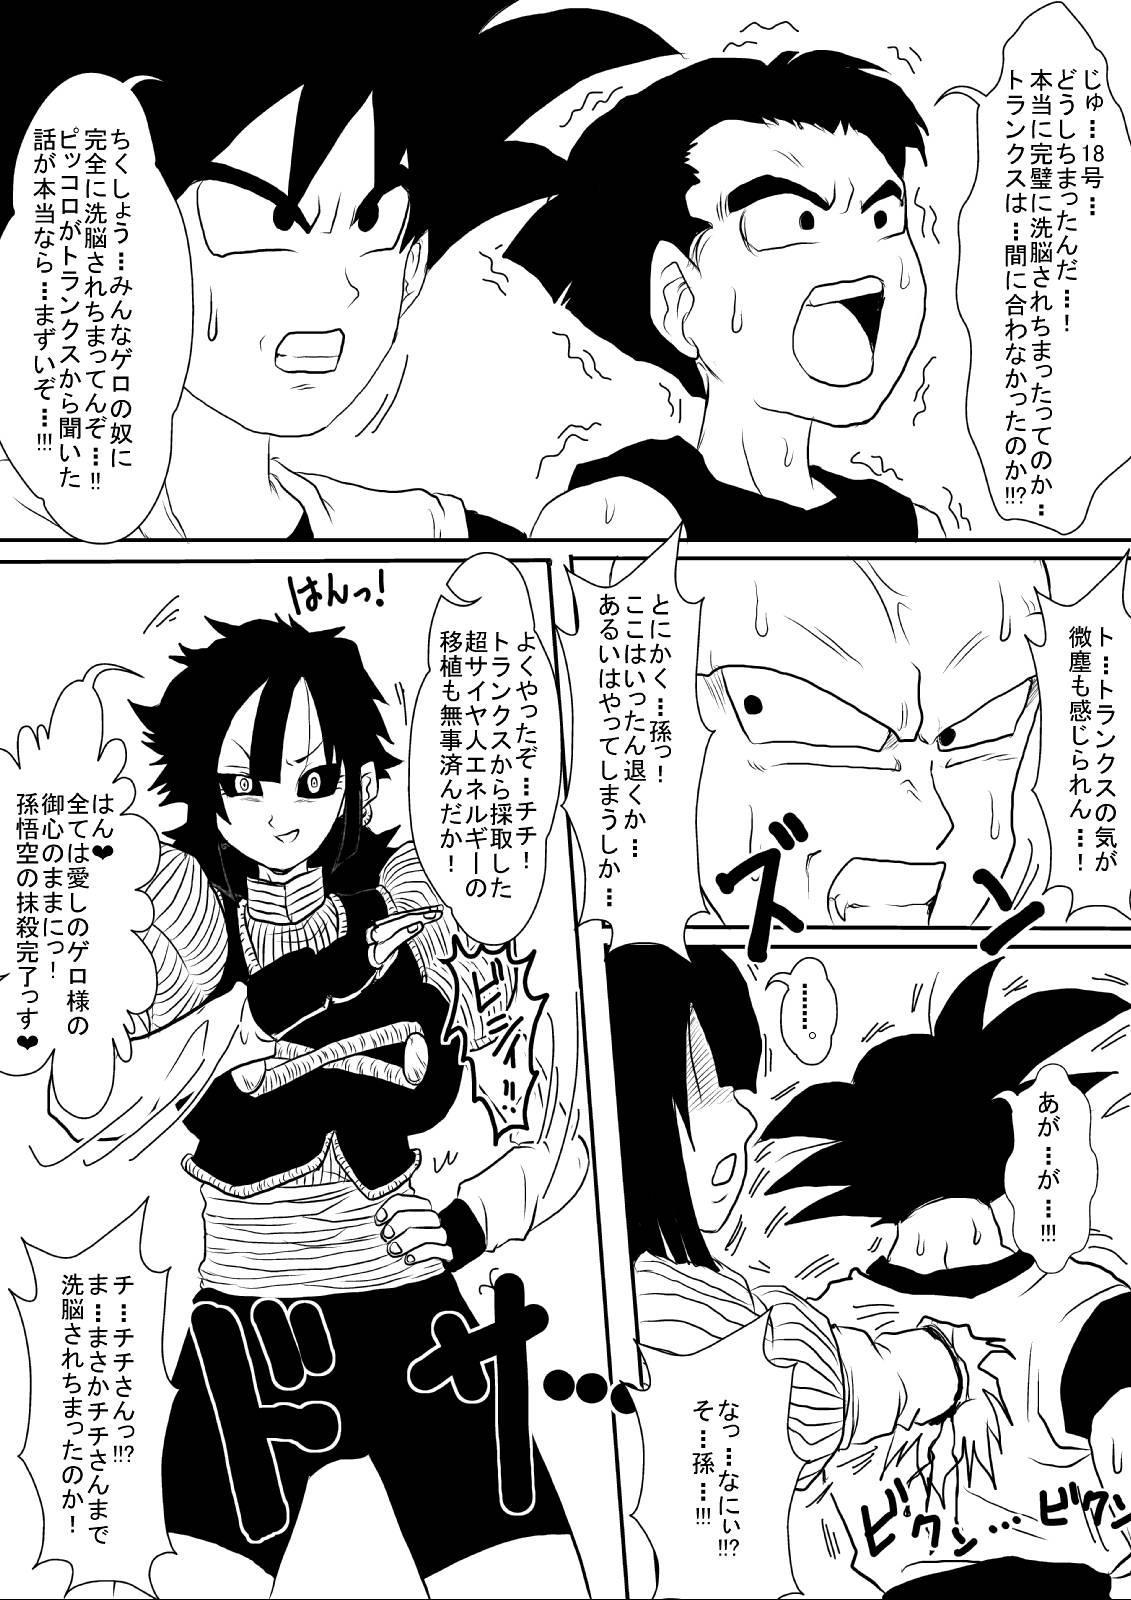 [Alice.Blood] Sennou Kyouiku-shitsu~ Jinzou ☆-kan 18-gou-hen (Dragon Ball Z) 38